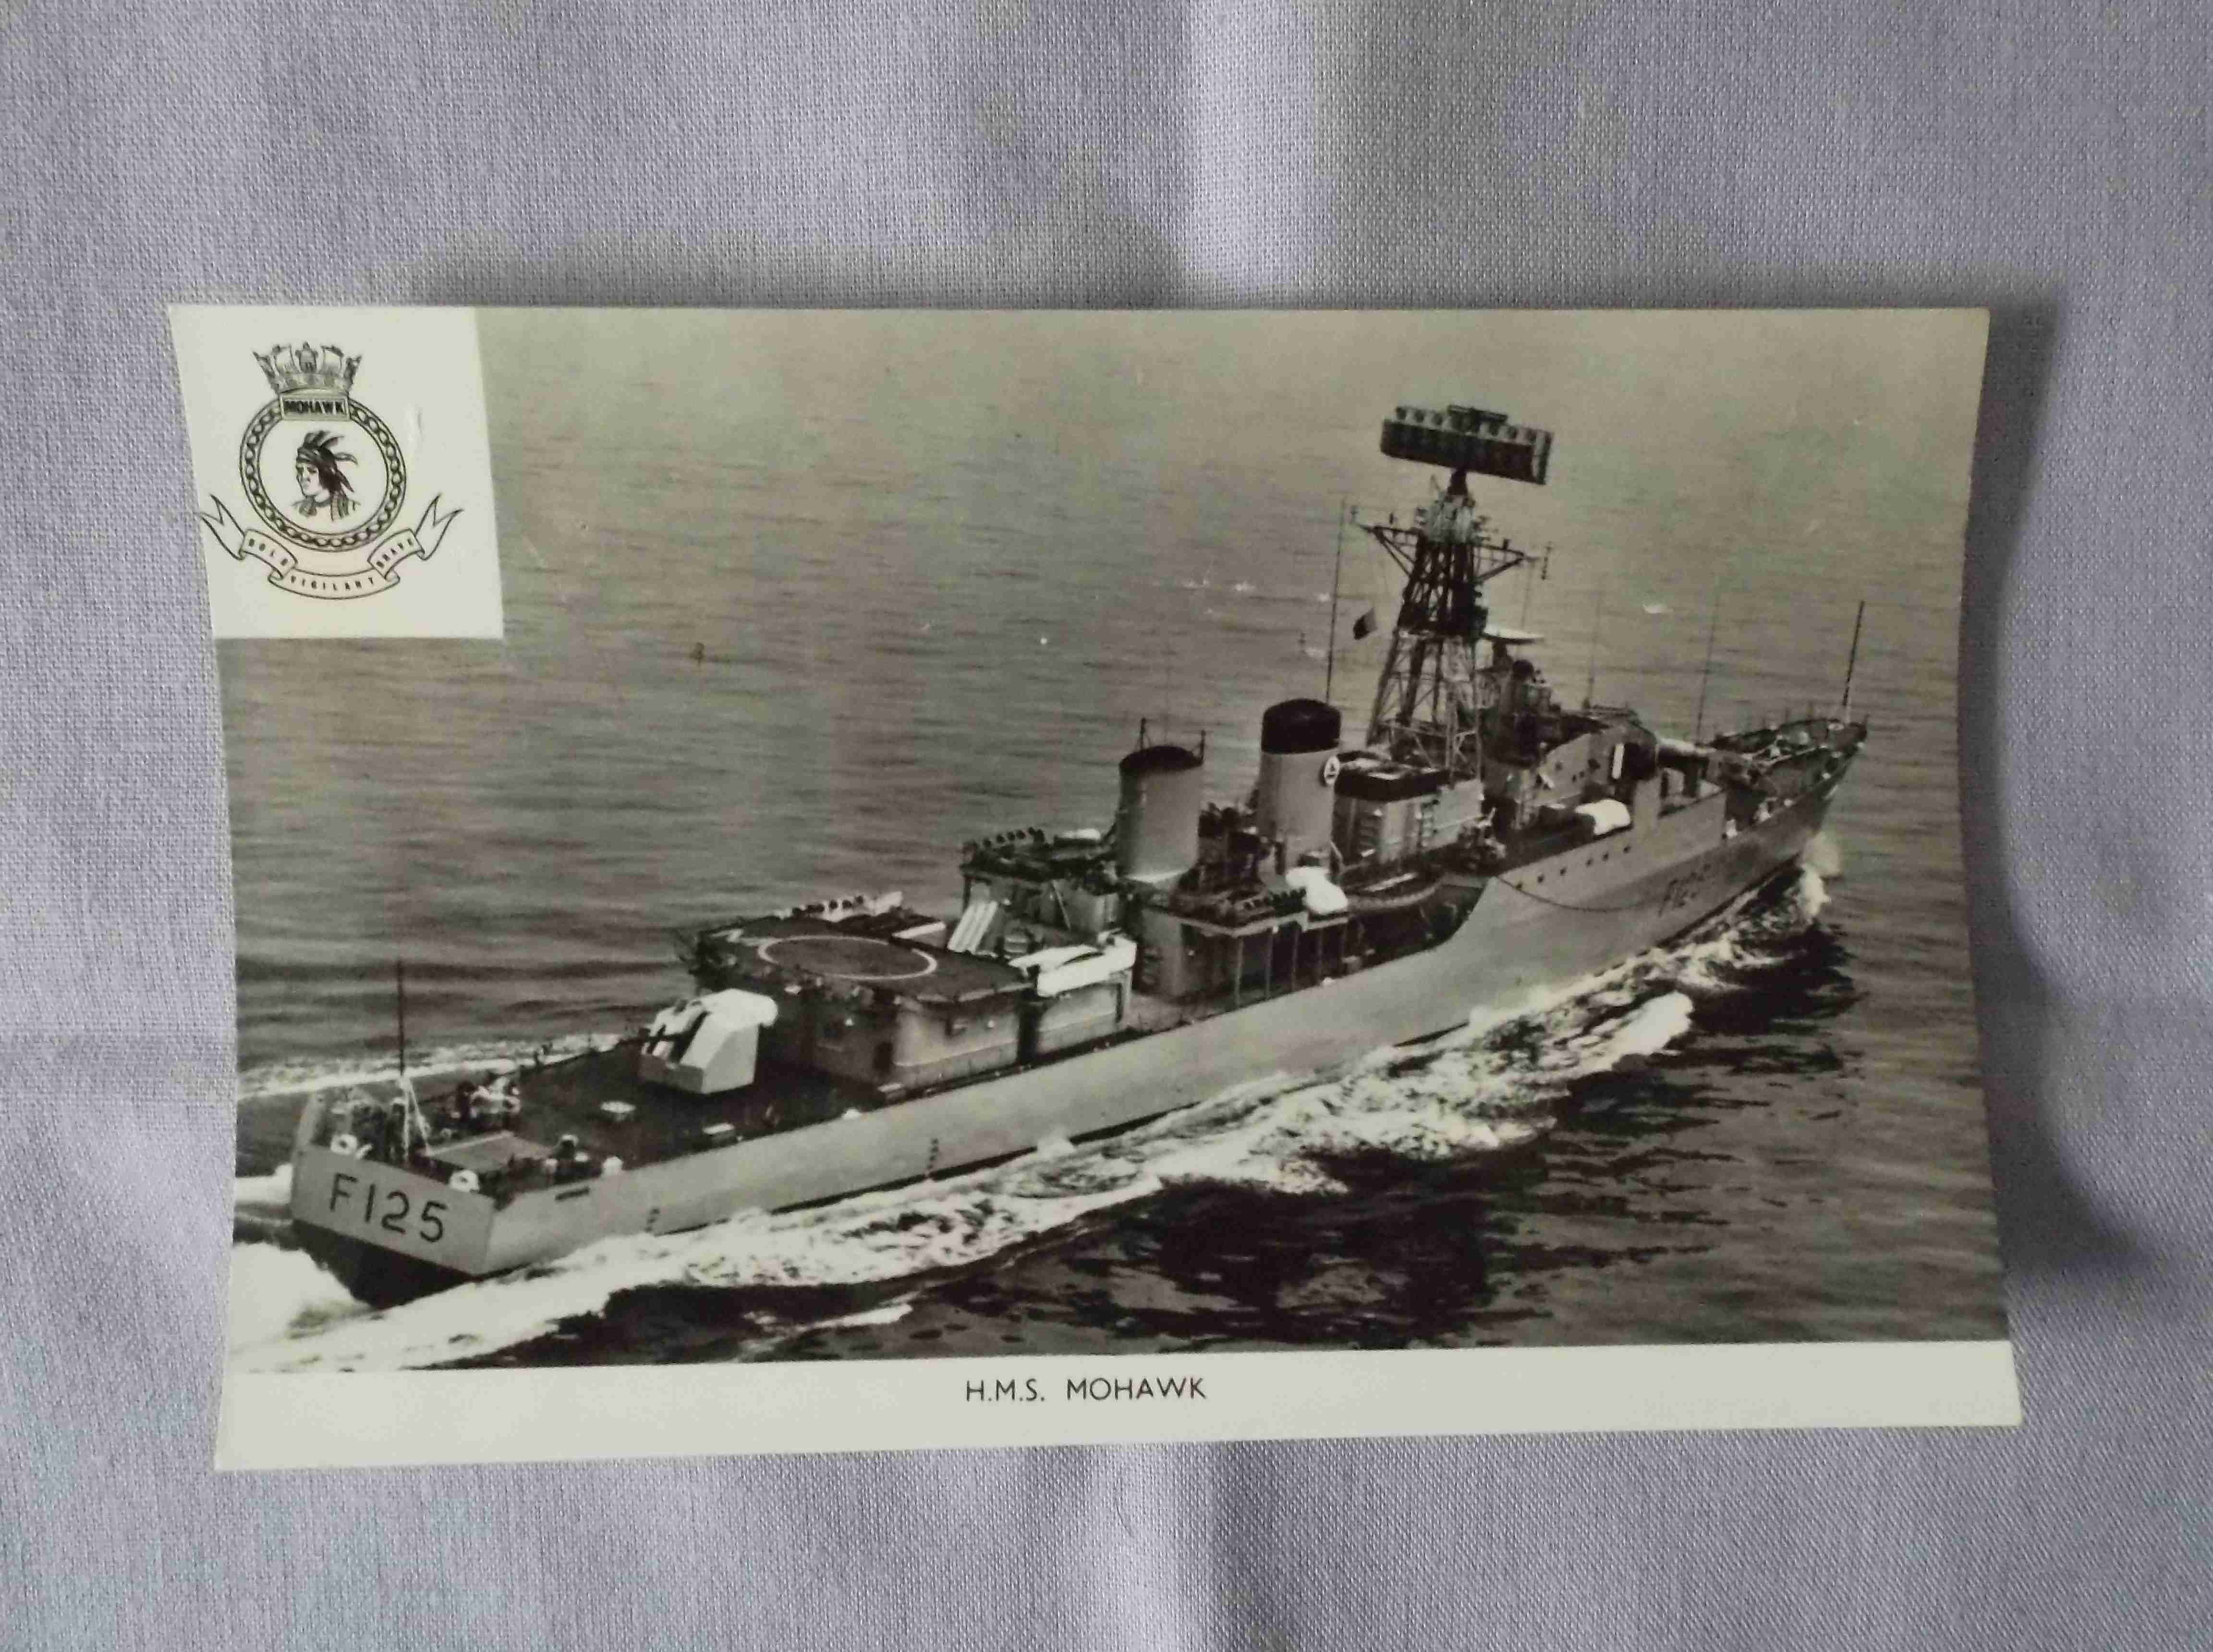 POSTCARD SIZE PHOTOGRAPH OF THE ROYAL NAVAL VESSEL HMS MOHAWK